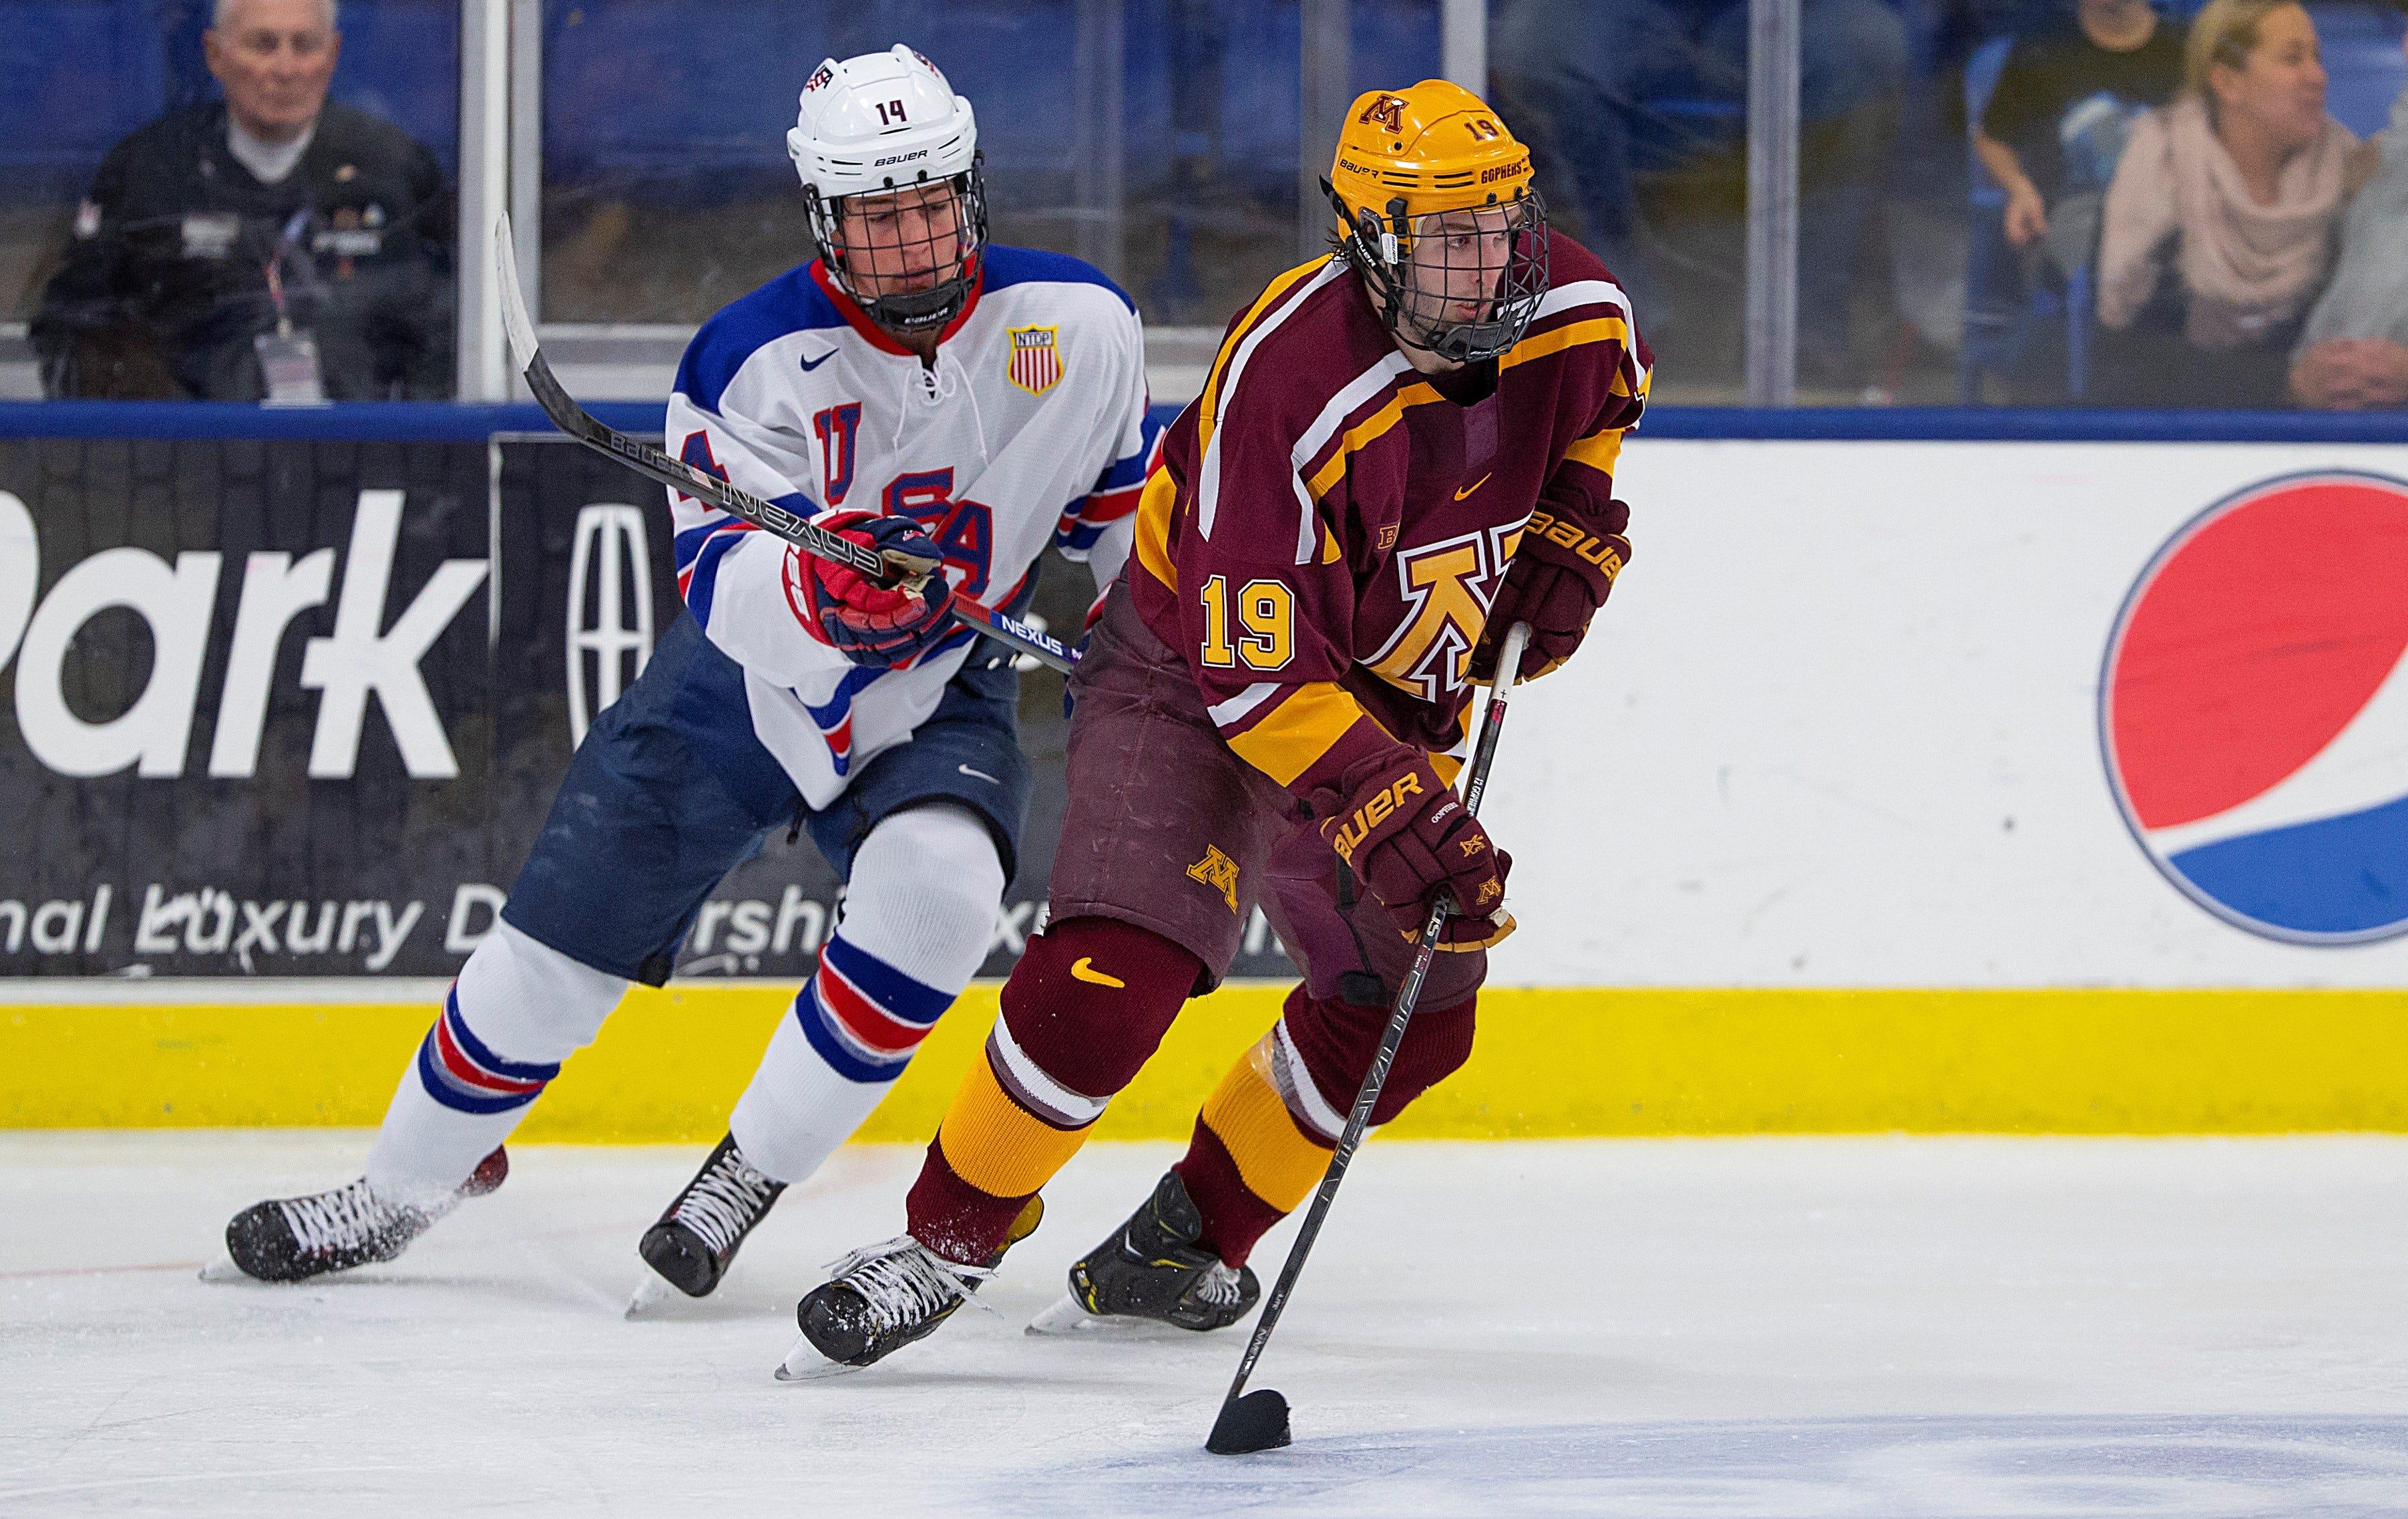 Minnesota Gophers Spoil Home Opener For U.S. NTDP Under-18 Team (video)